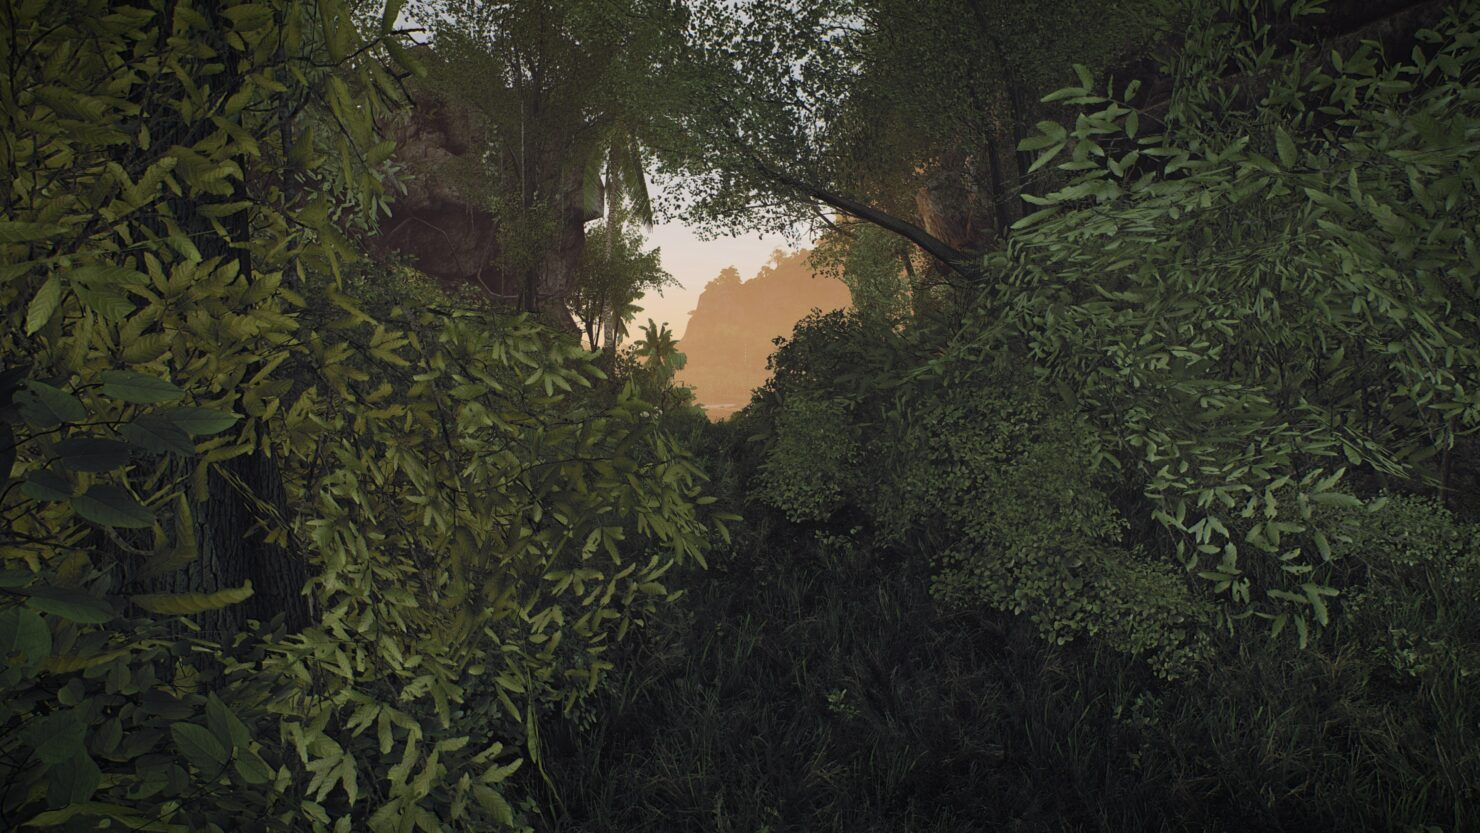 island-forest-morning_49959222736_o